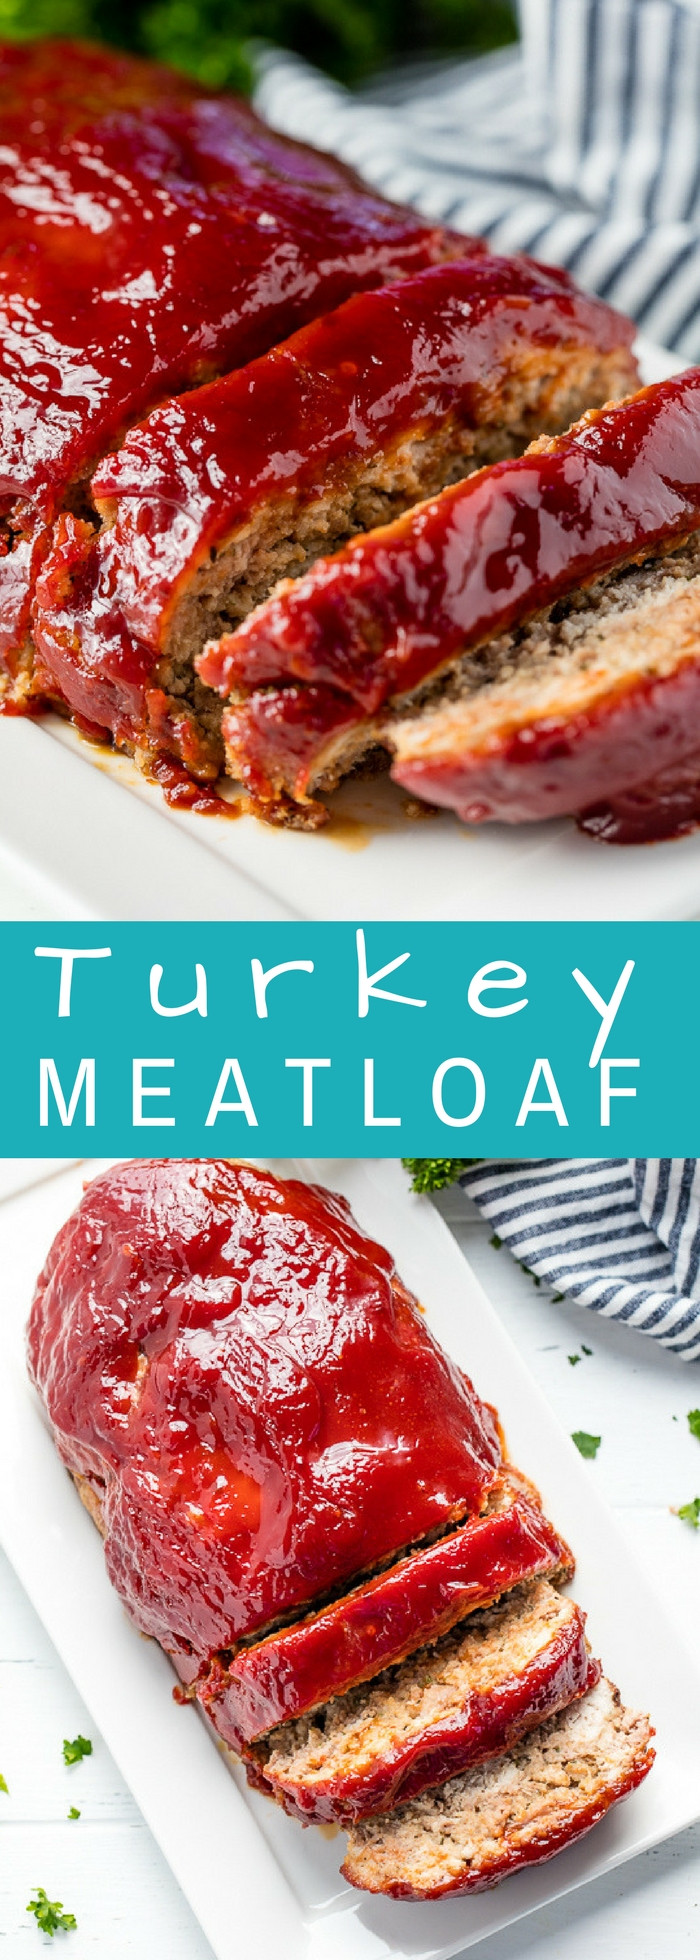 Healthy Turkey Meatloaf Recipe  Turkey Meatloaf